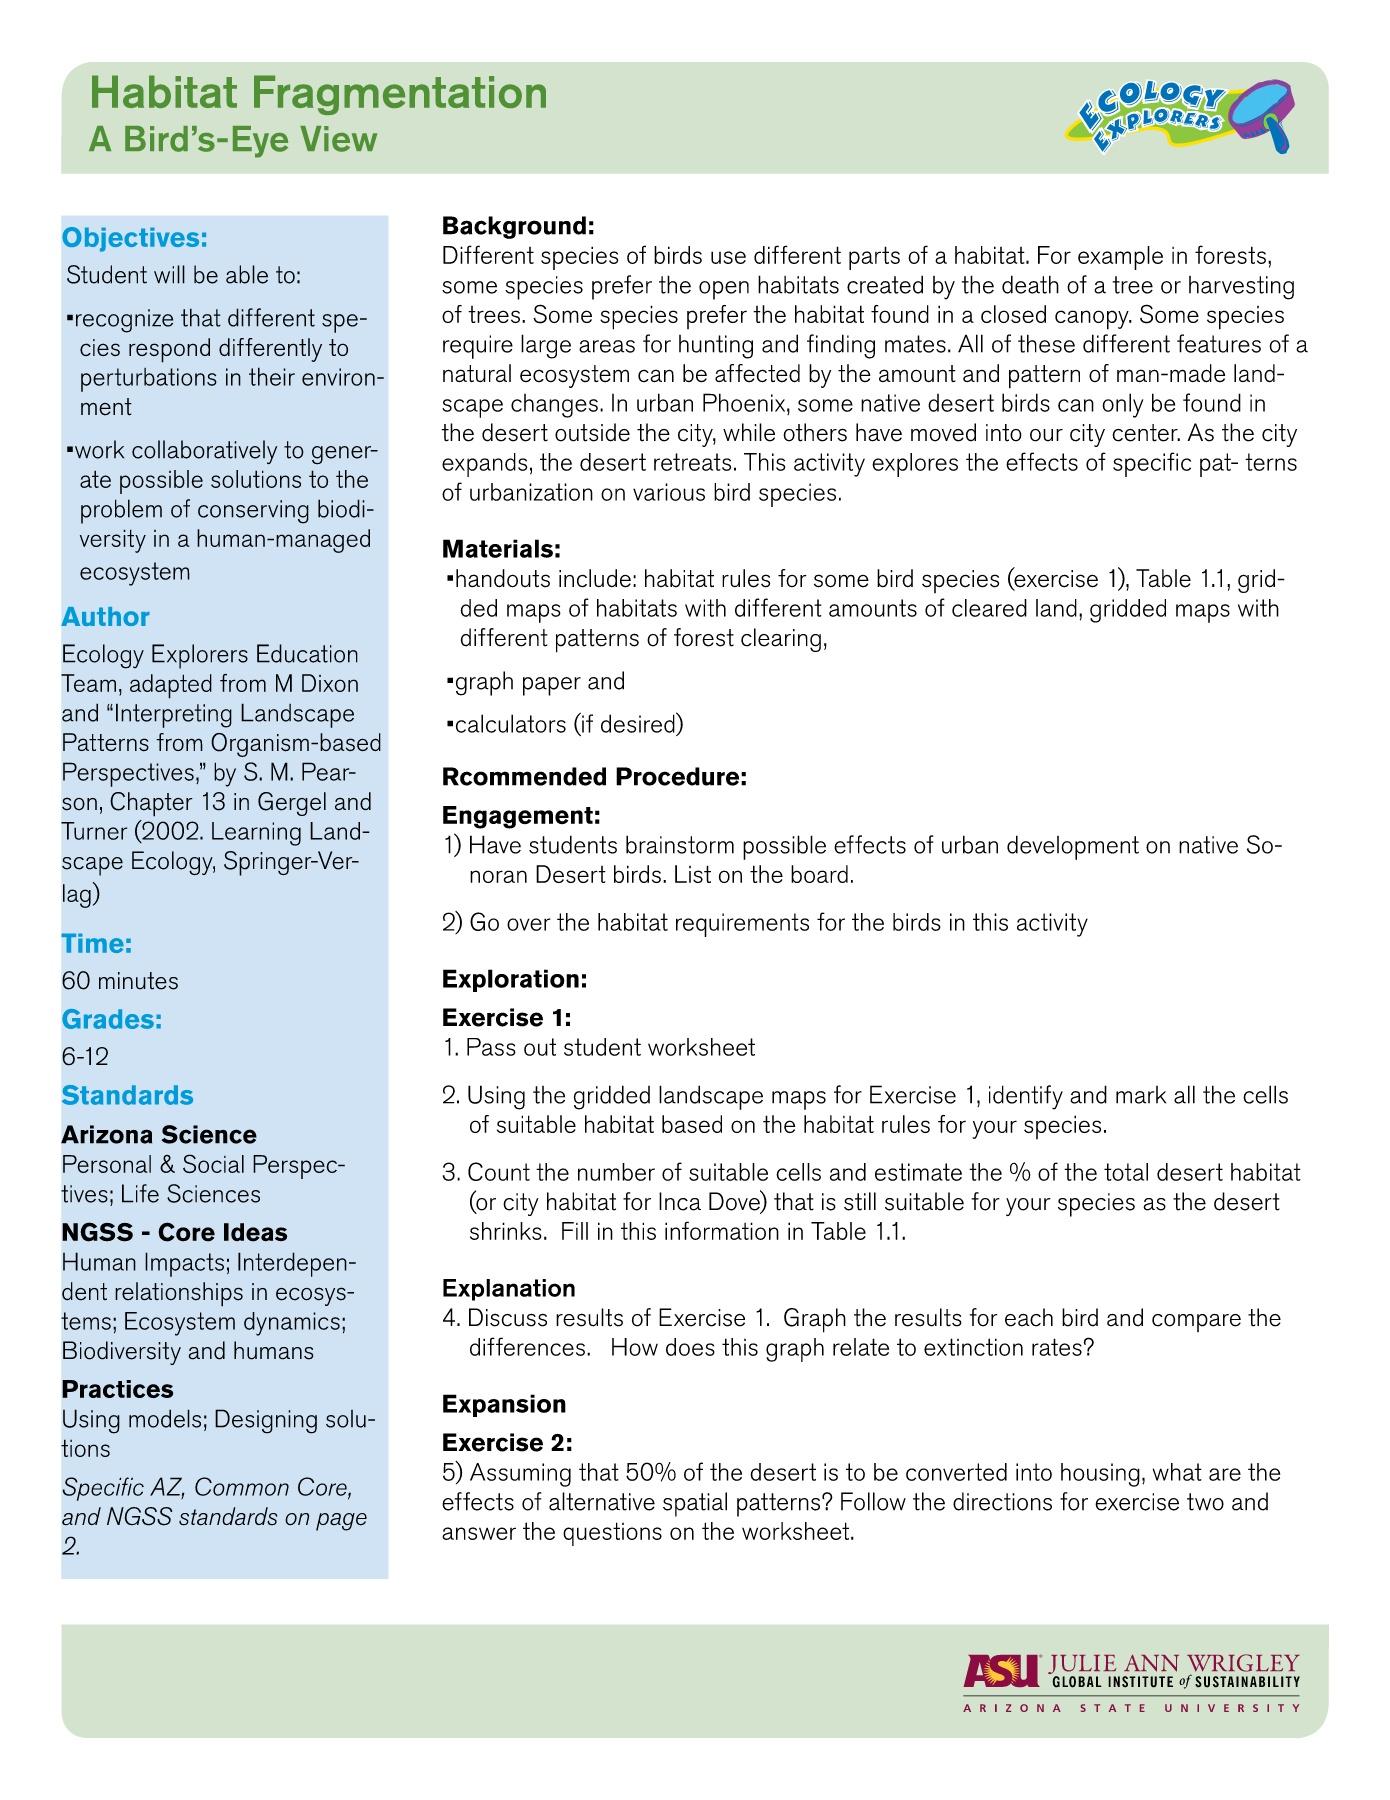 Habitat-Fragmentation-A-Birds-Eye-View-Flip eBook Pages 1 - 7  AnyFlip    AnyFlip [ 1800 x 1390 Pixel ]